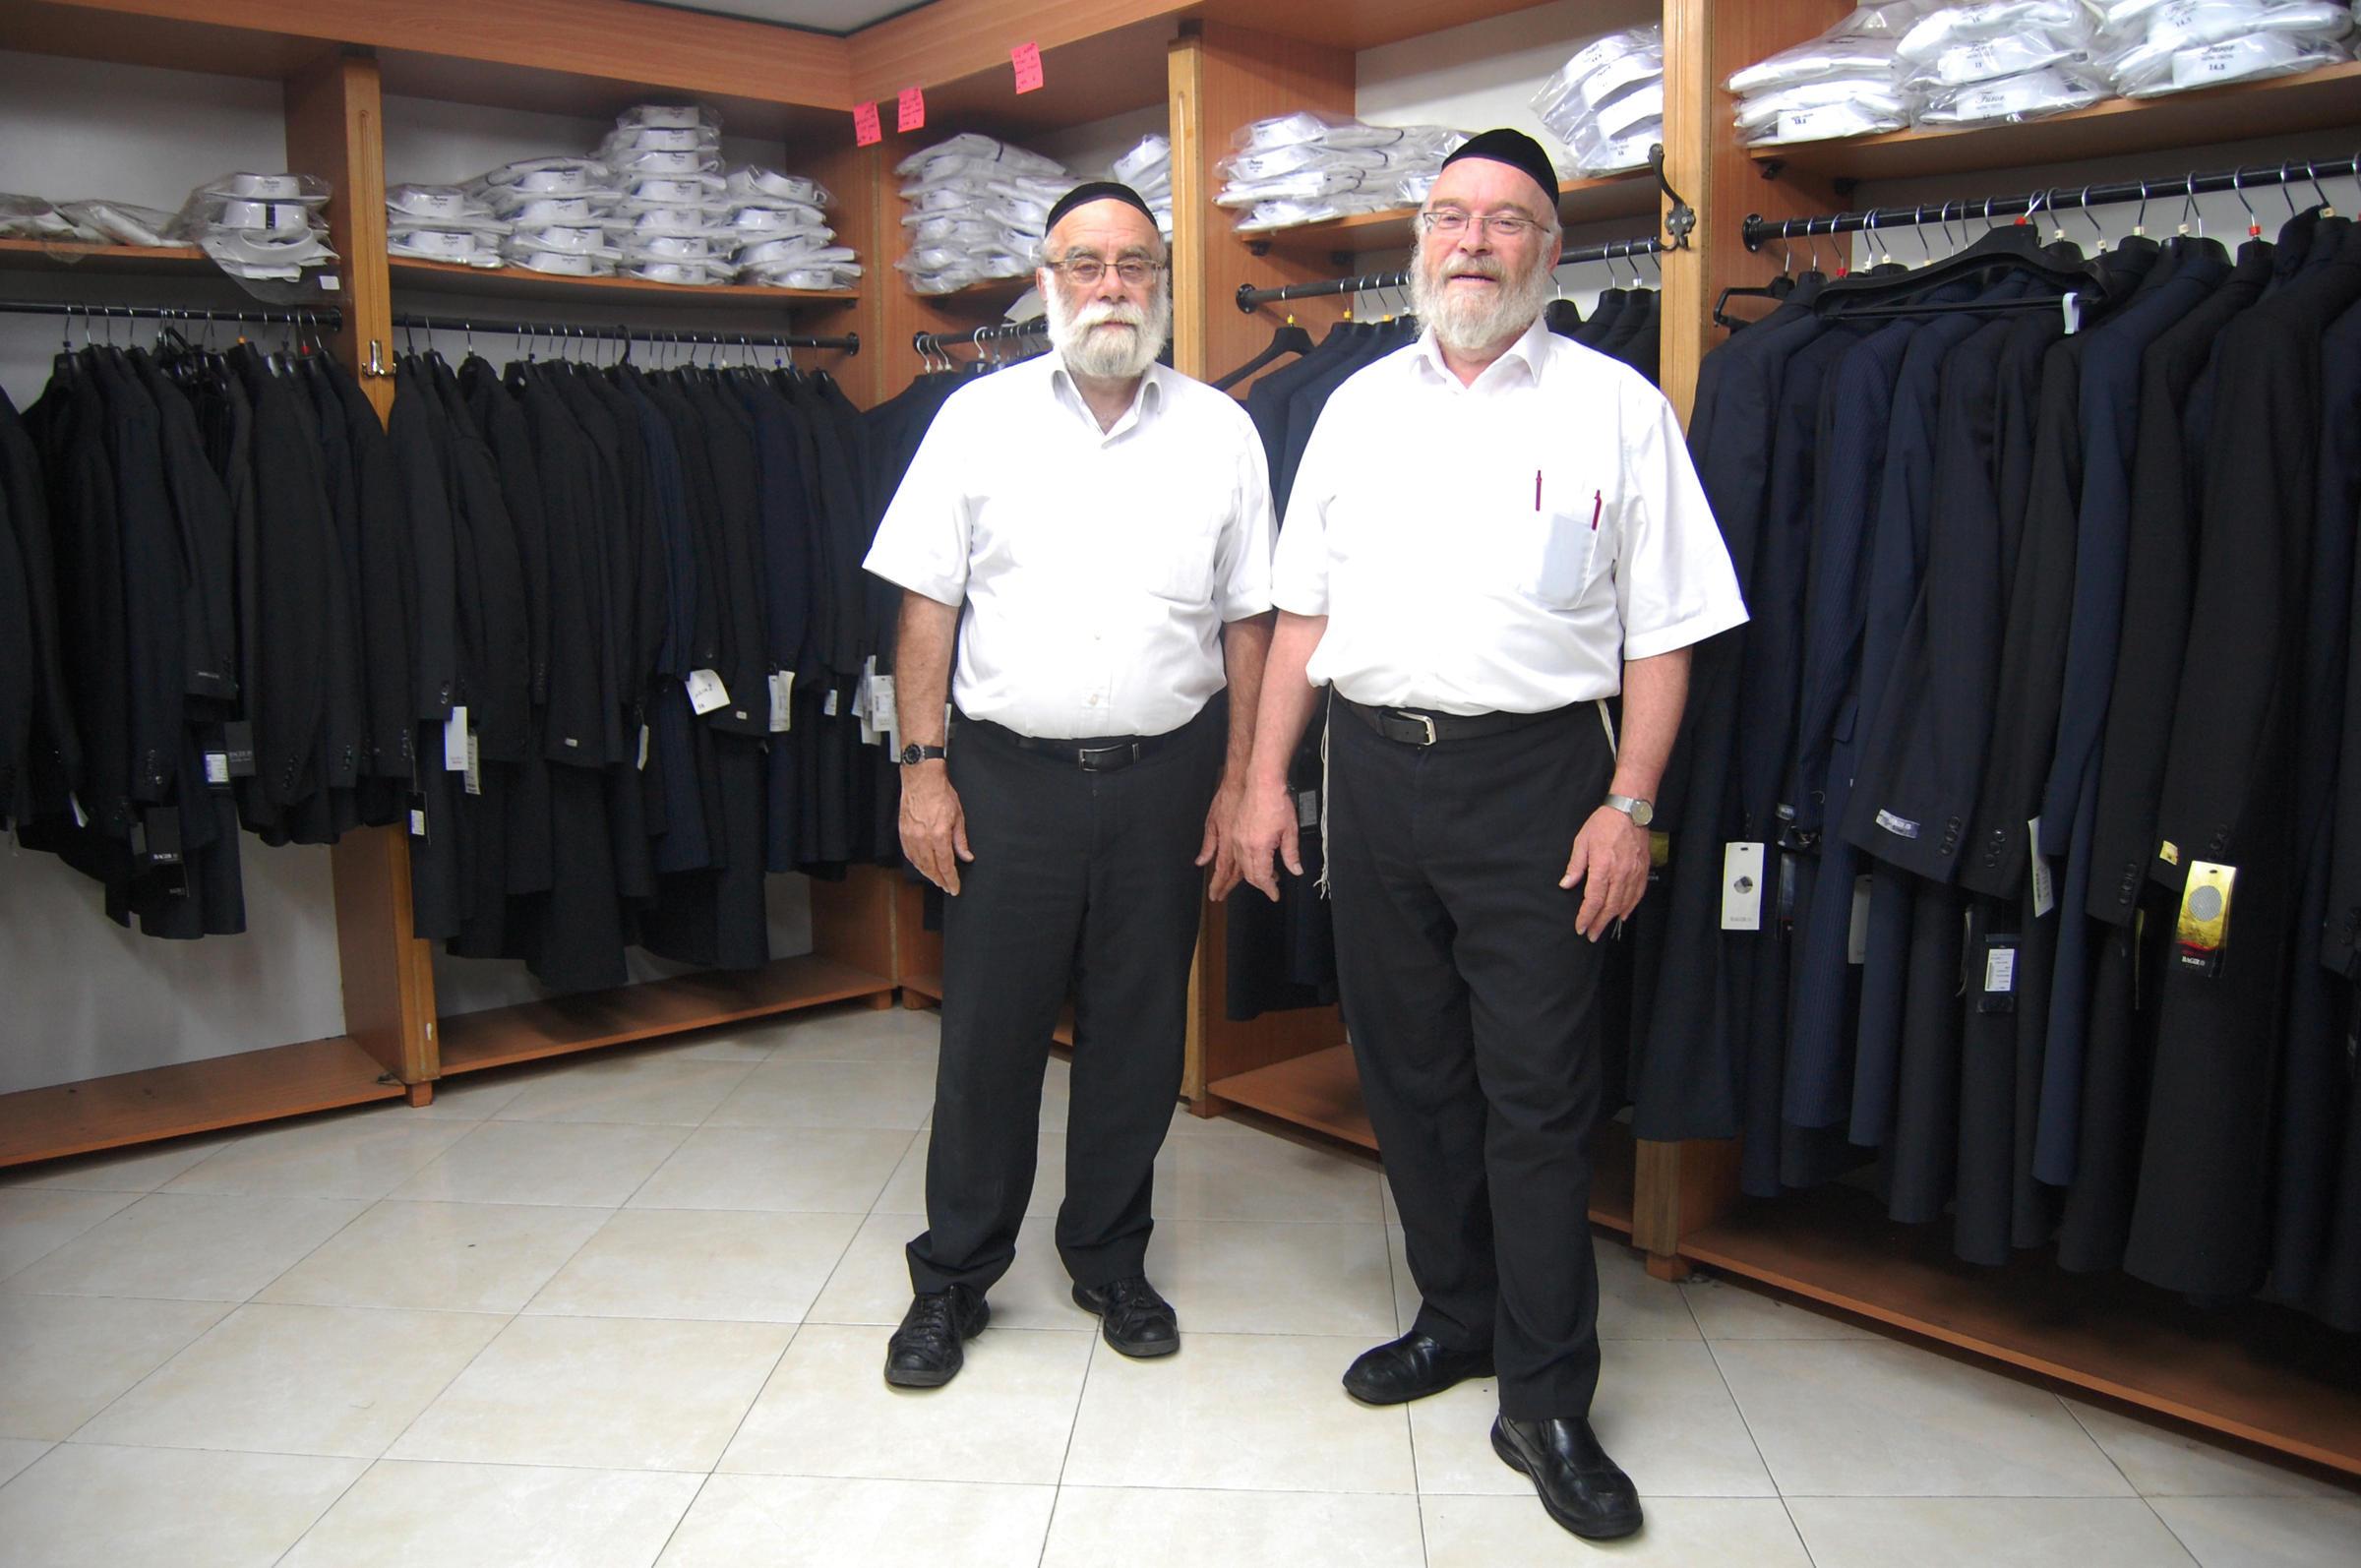 Jewish clothing store